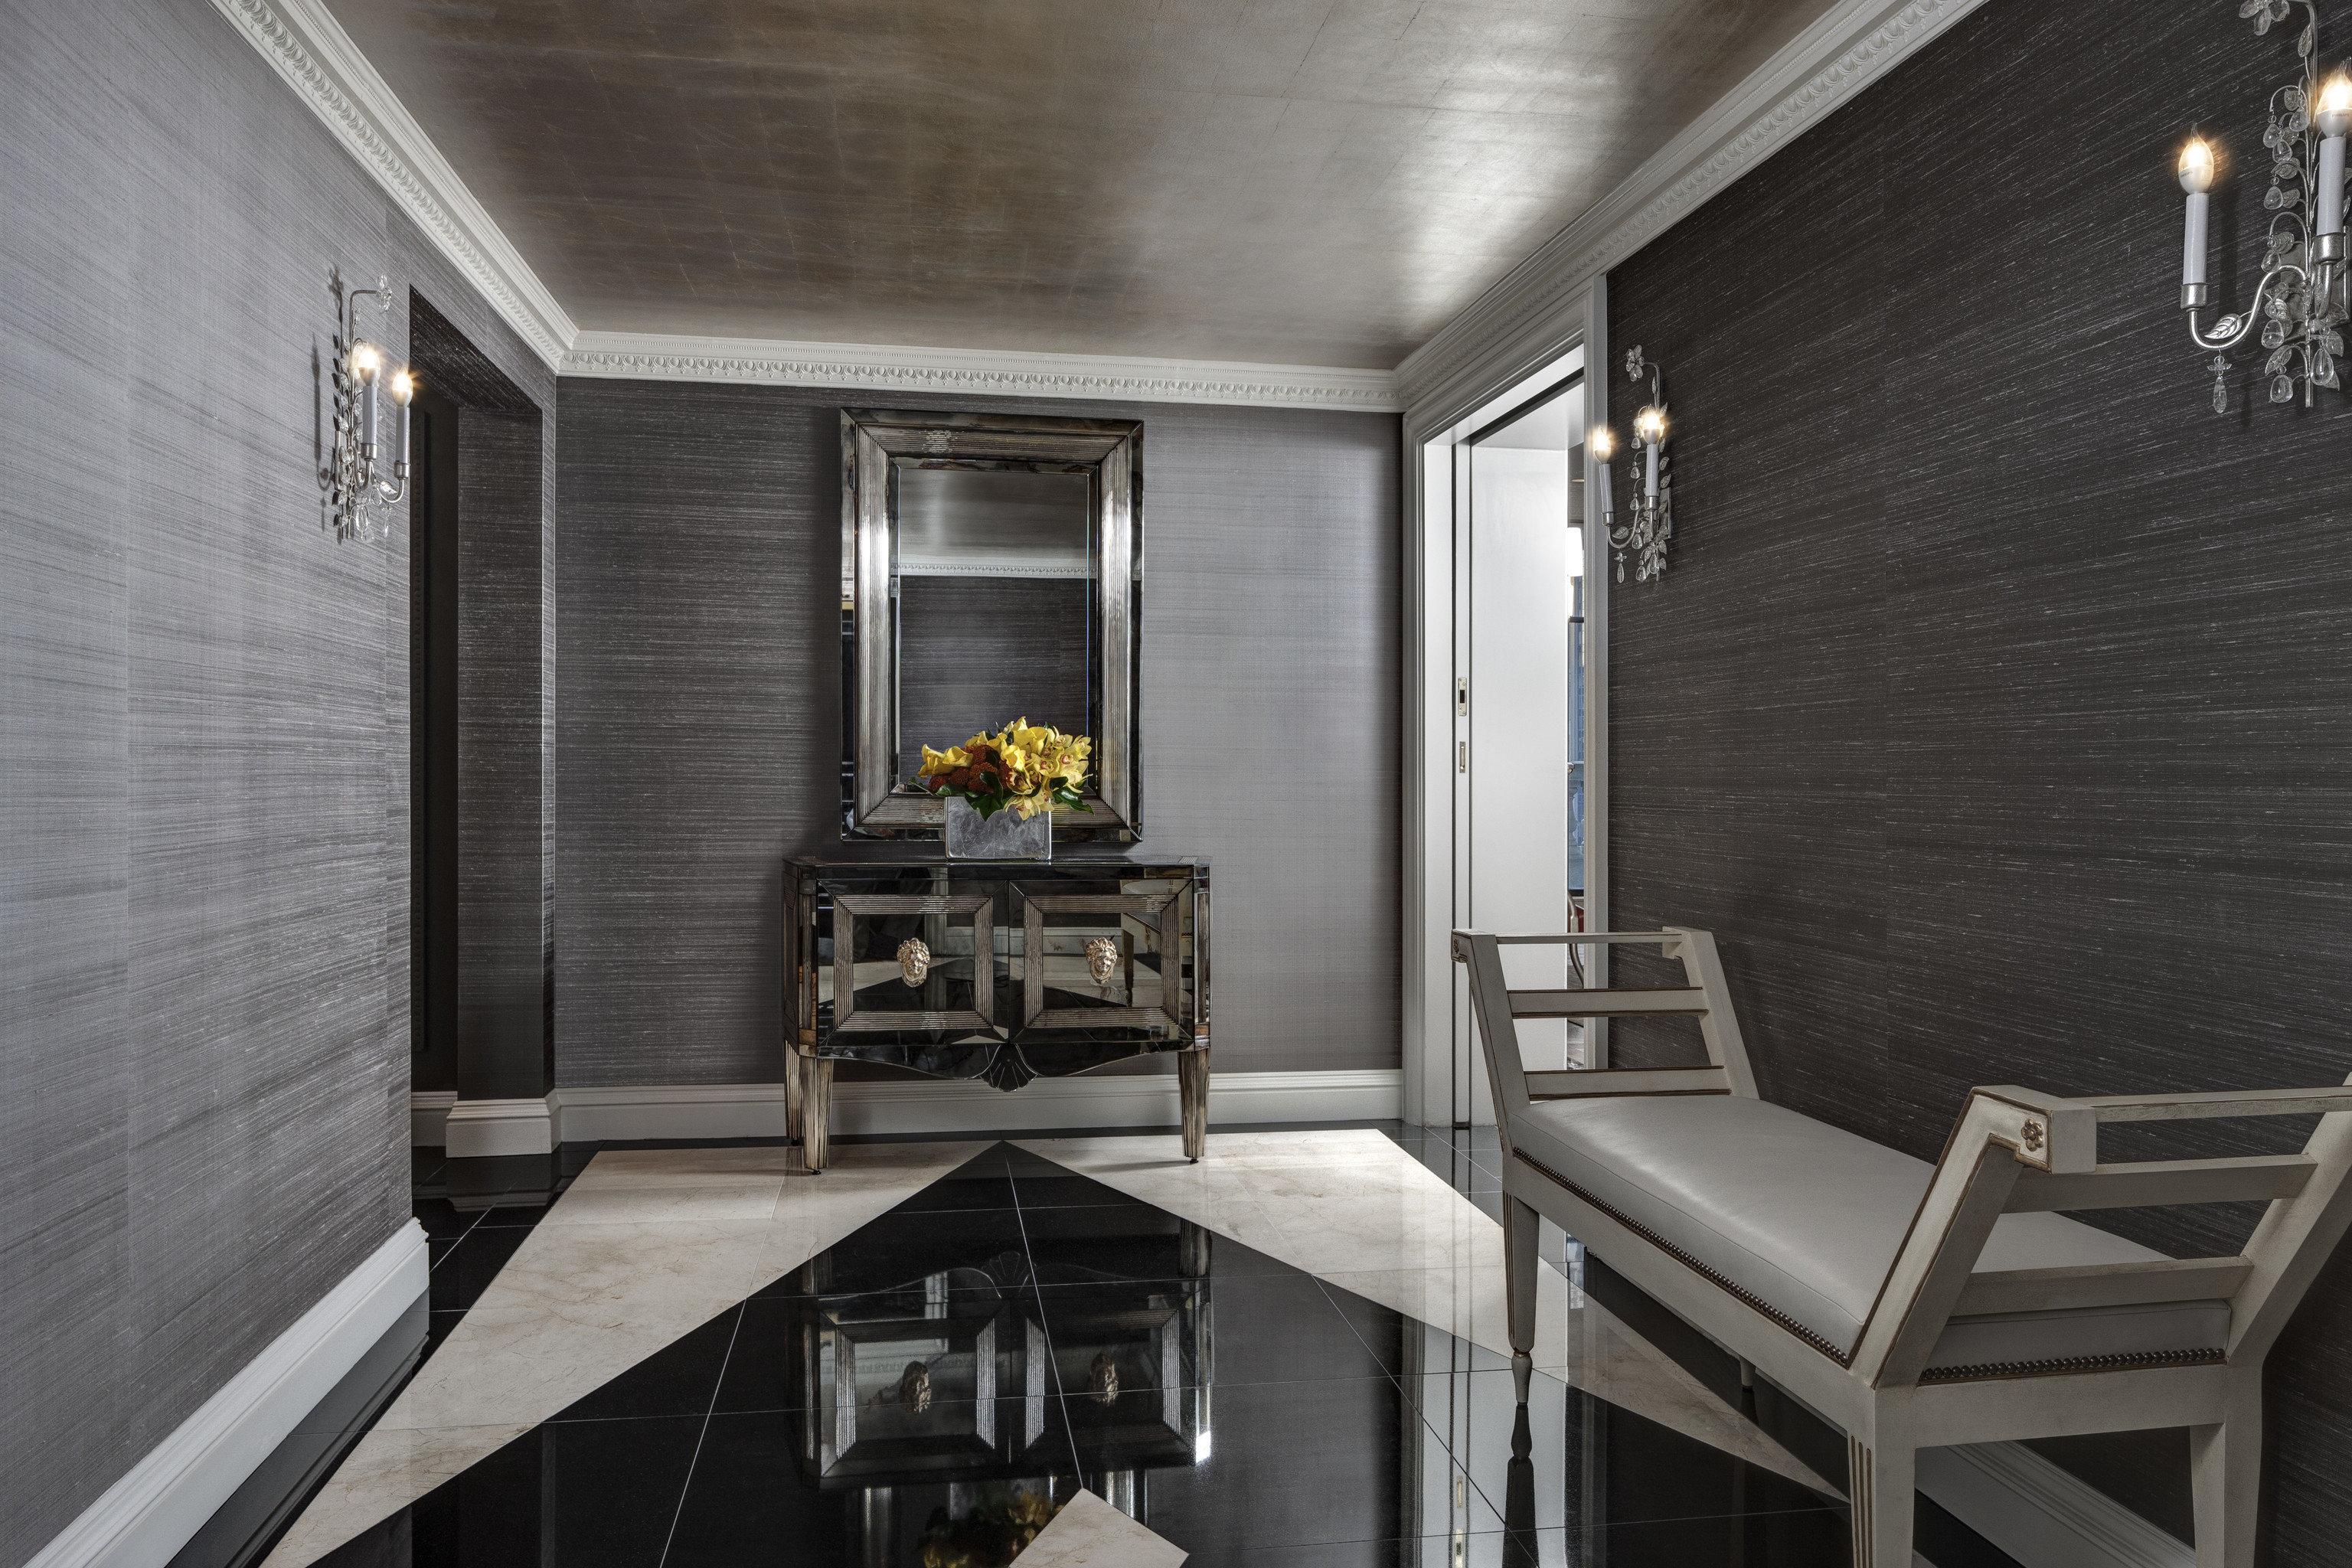 Hotels Luxury Travel indoor floor room property window house ceiling home interior design living room estate Design loft cottage dining room furniture